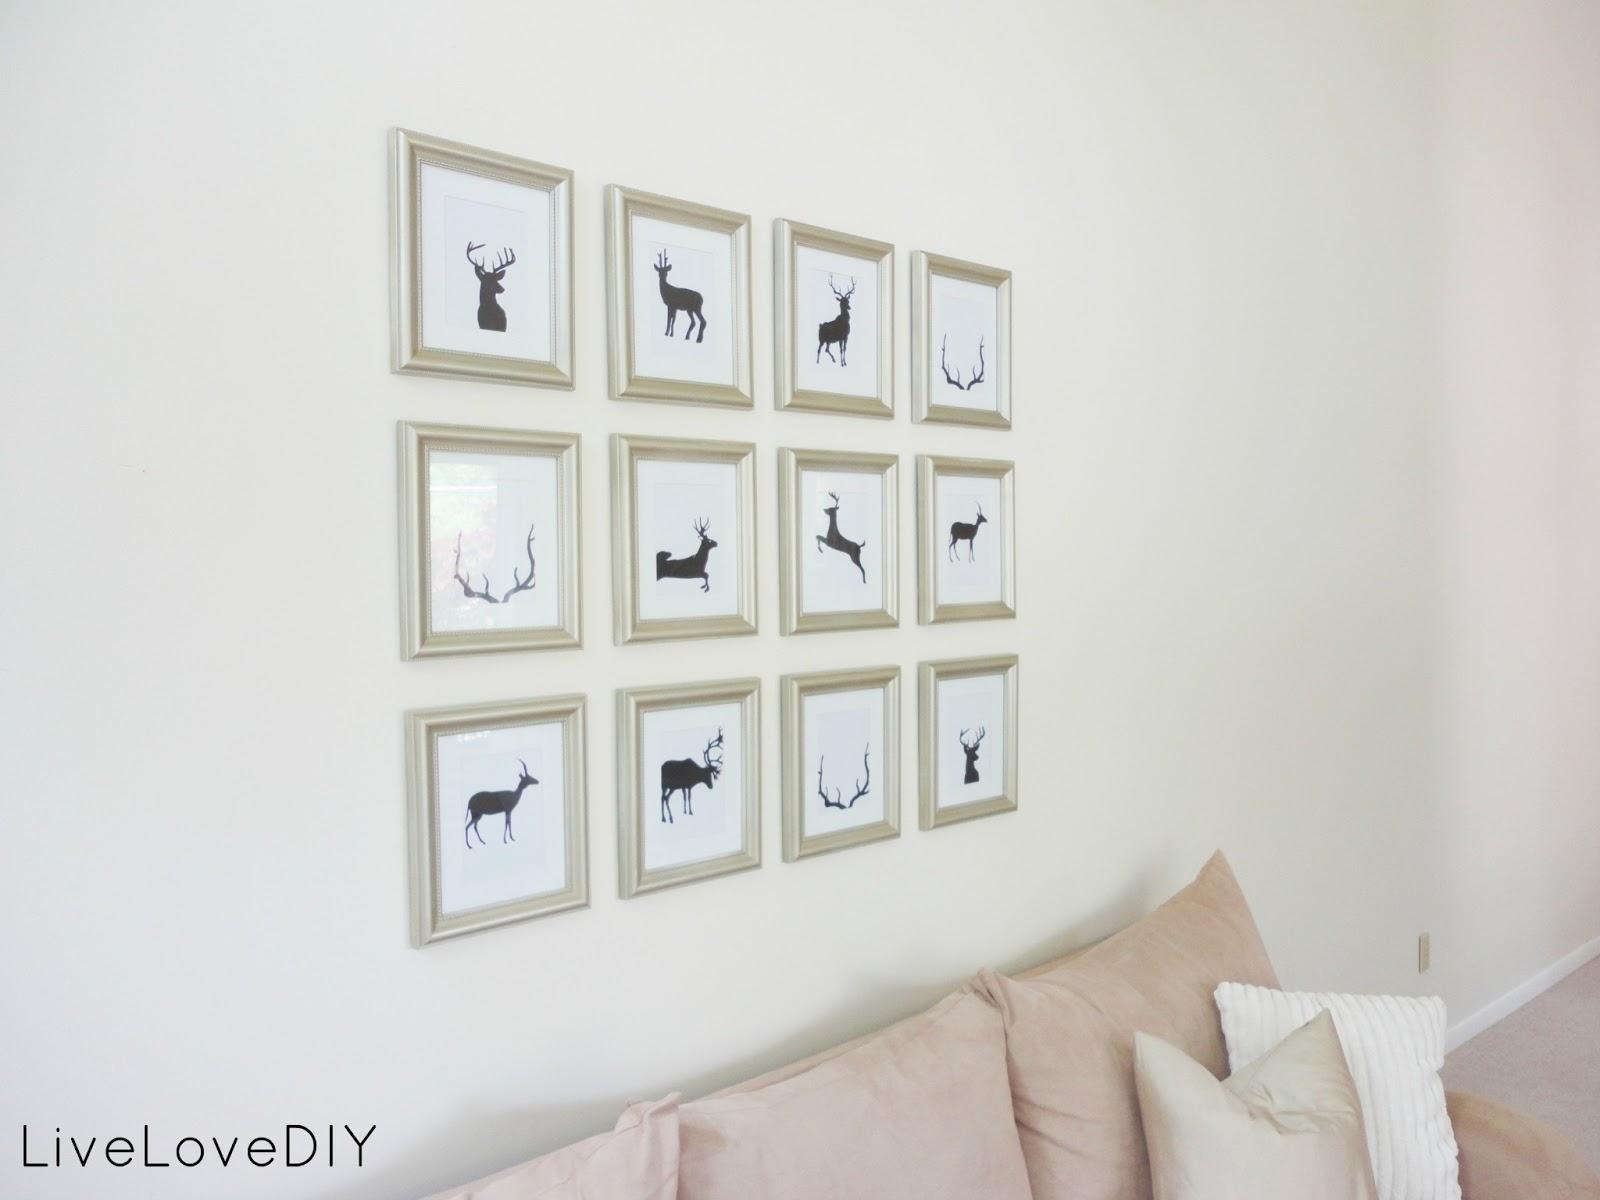 Livelovediy cheap wall art ideas antler silhouette for Cheap wall art ideas